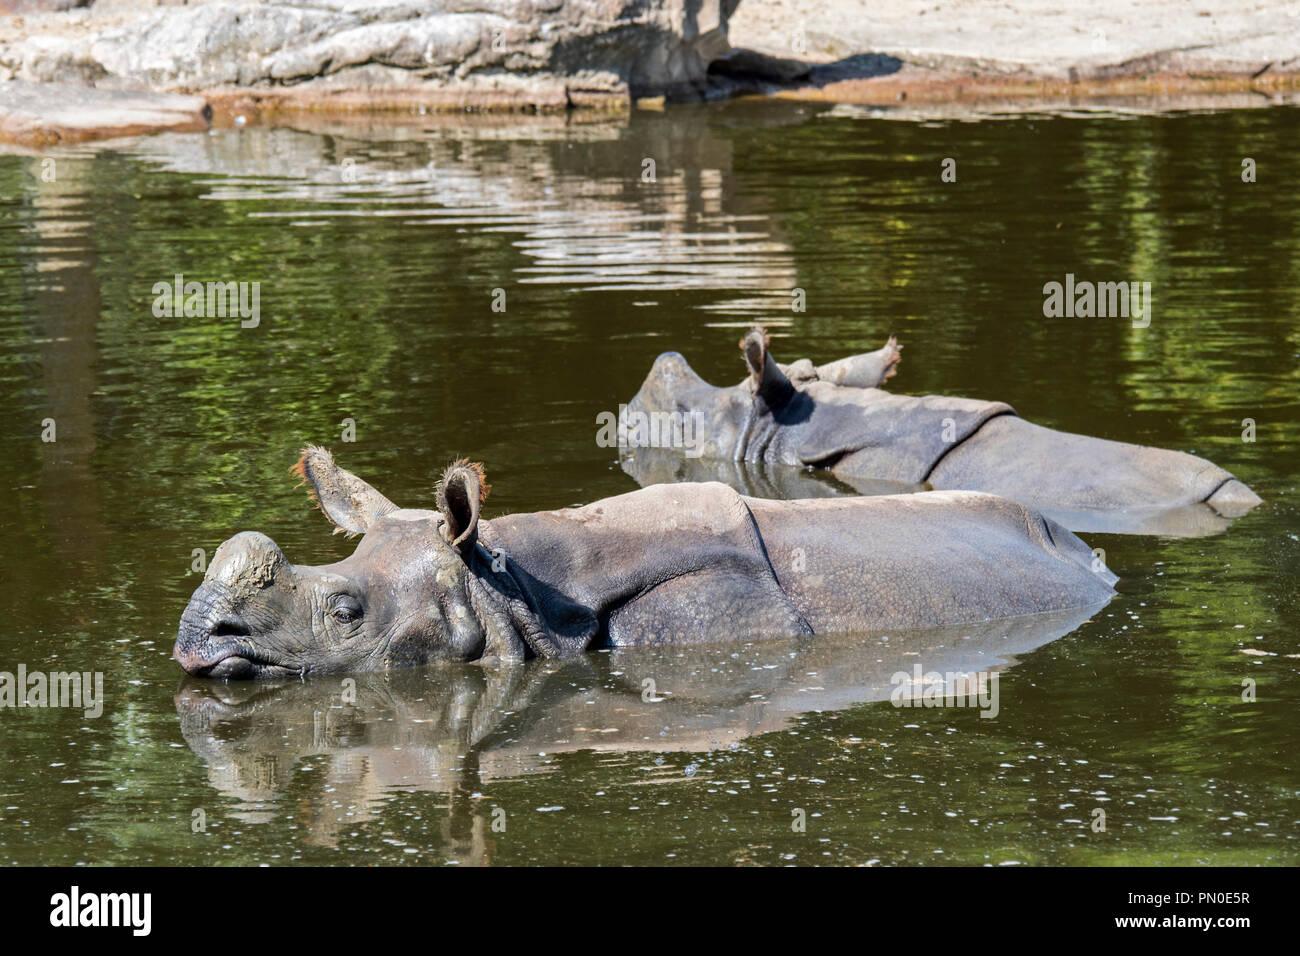 Indian rhinoceros (Rhinoceros unicornis) female with young bathing in pond - Stock Image